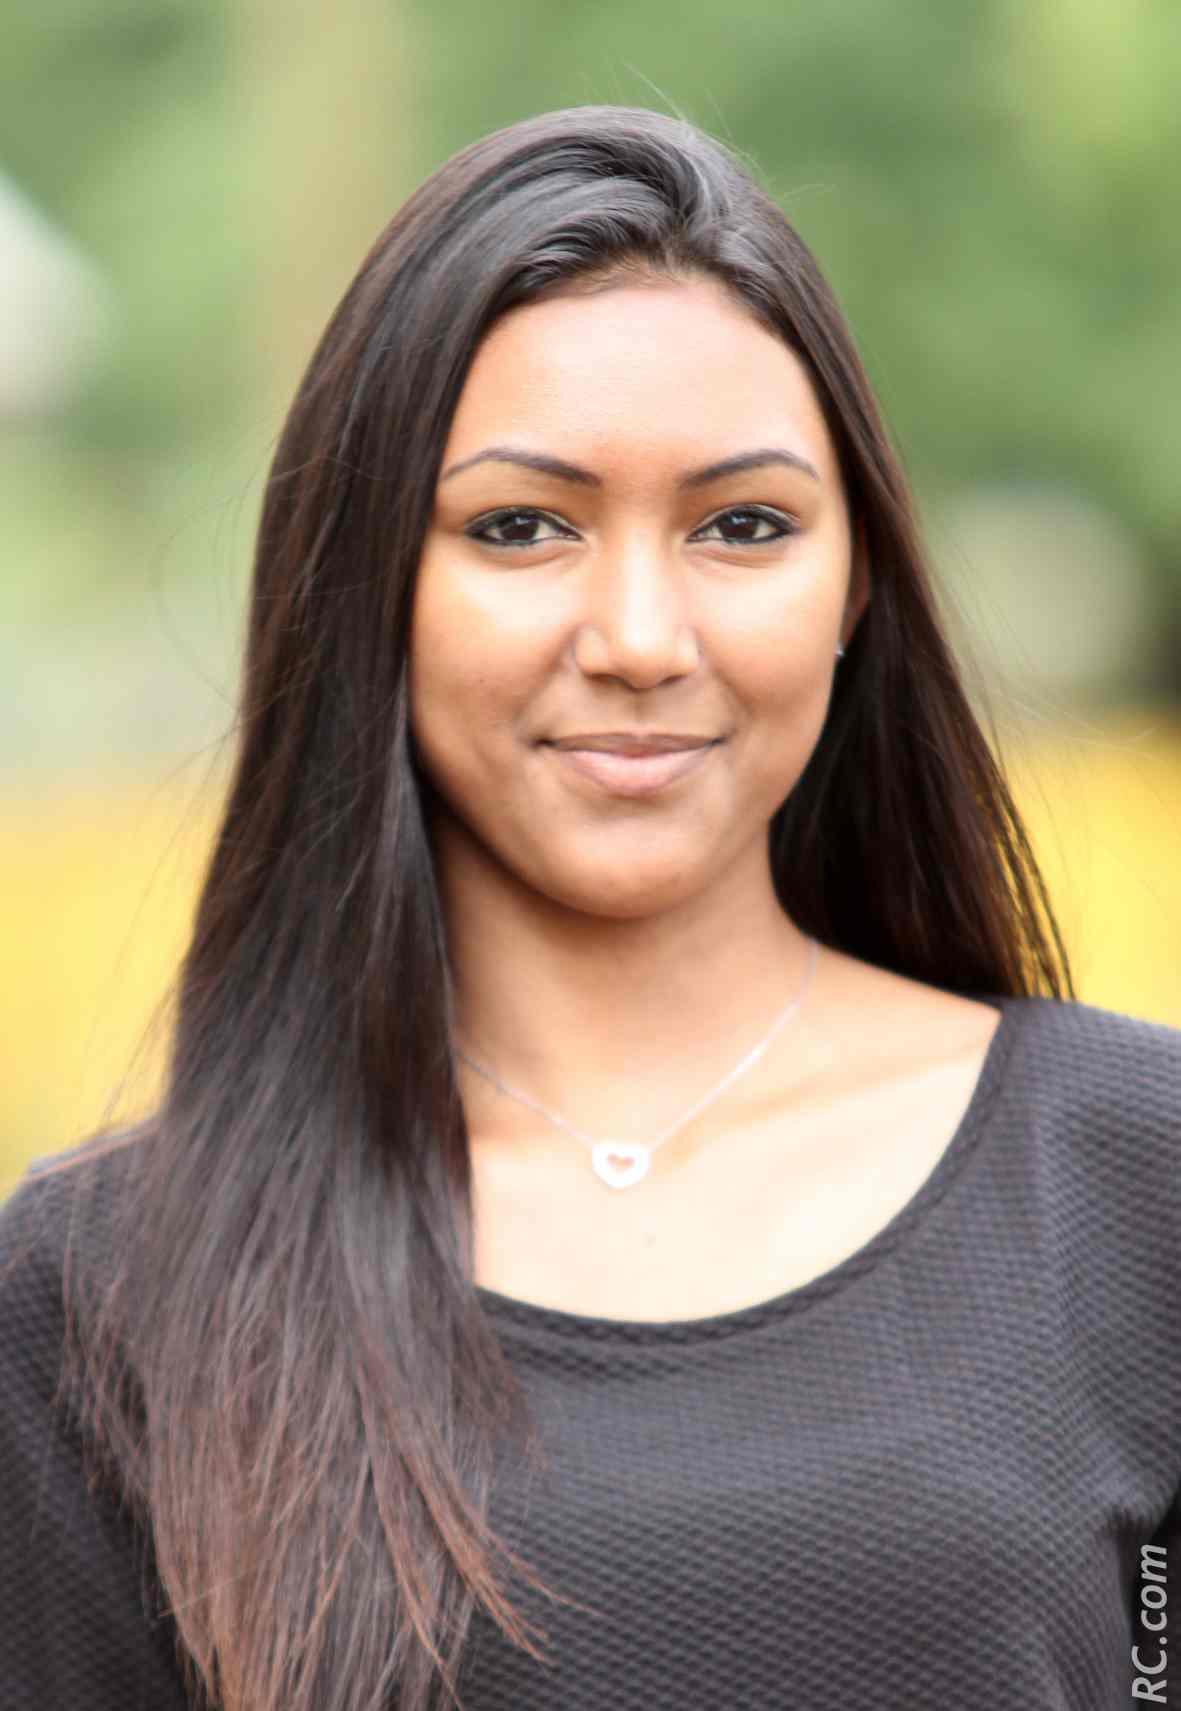 11. Karen Timbou